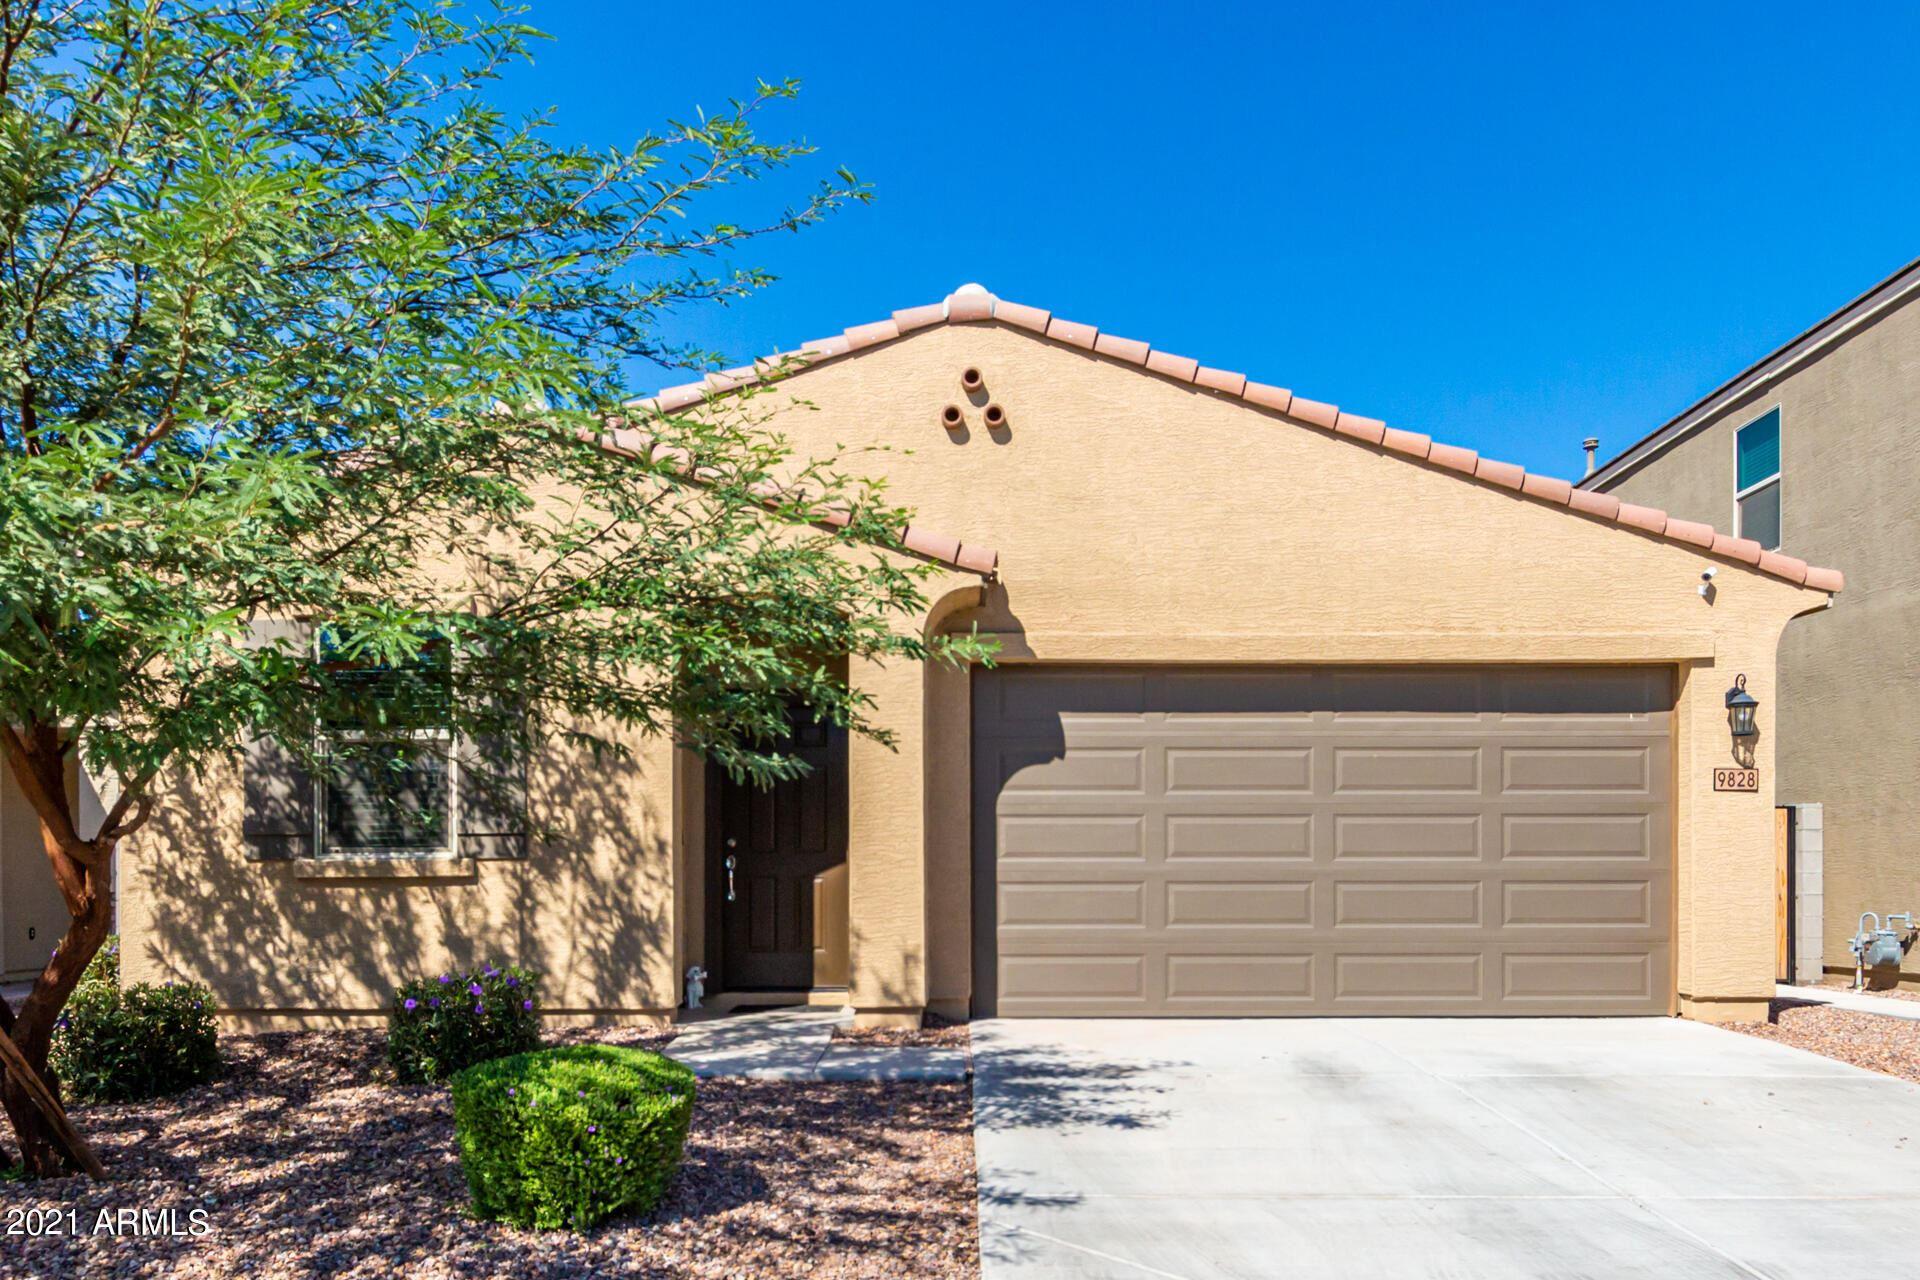 Photo of 9828 W ATLANTIS Way, Tolleson, AZ 85353 (MLS # 6305359)